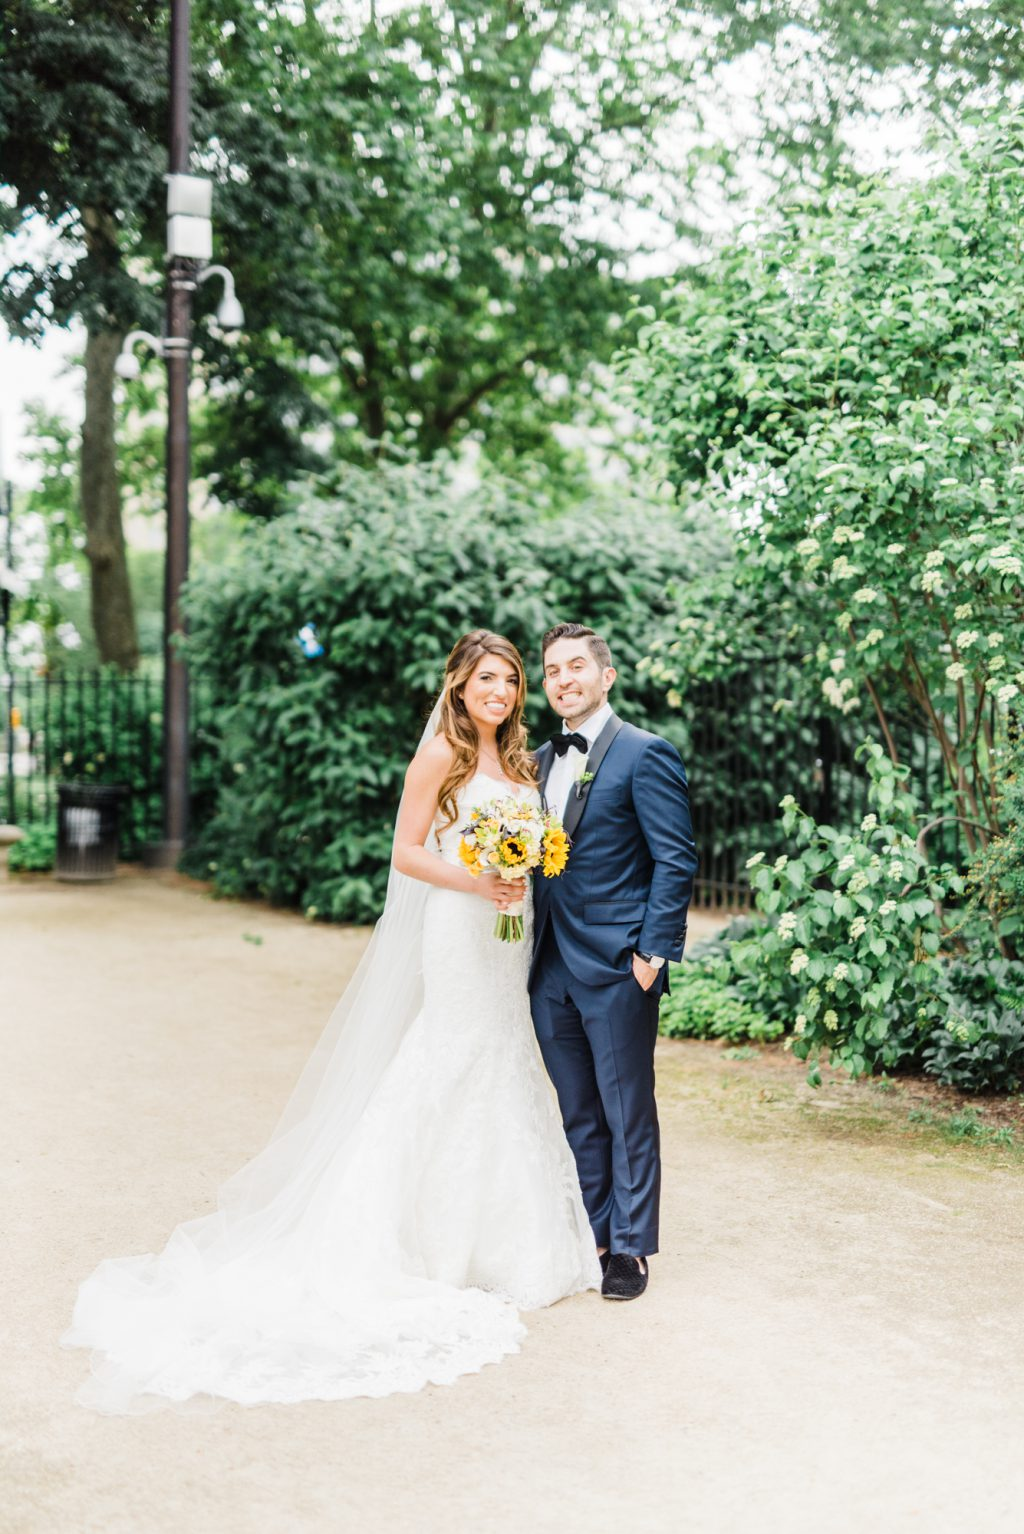 haleyrichterphoto-front-and-palmer-spring-wedding-rodin-museum-loews-hotel-philadelphia-080